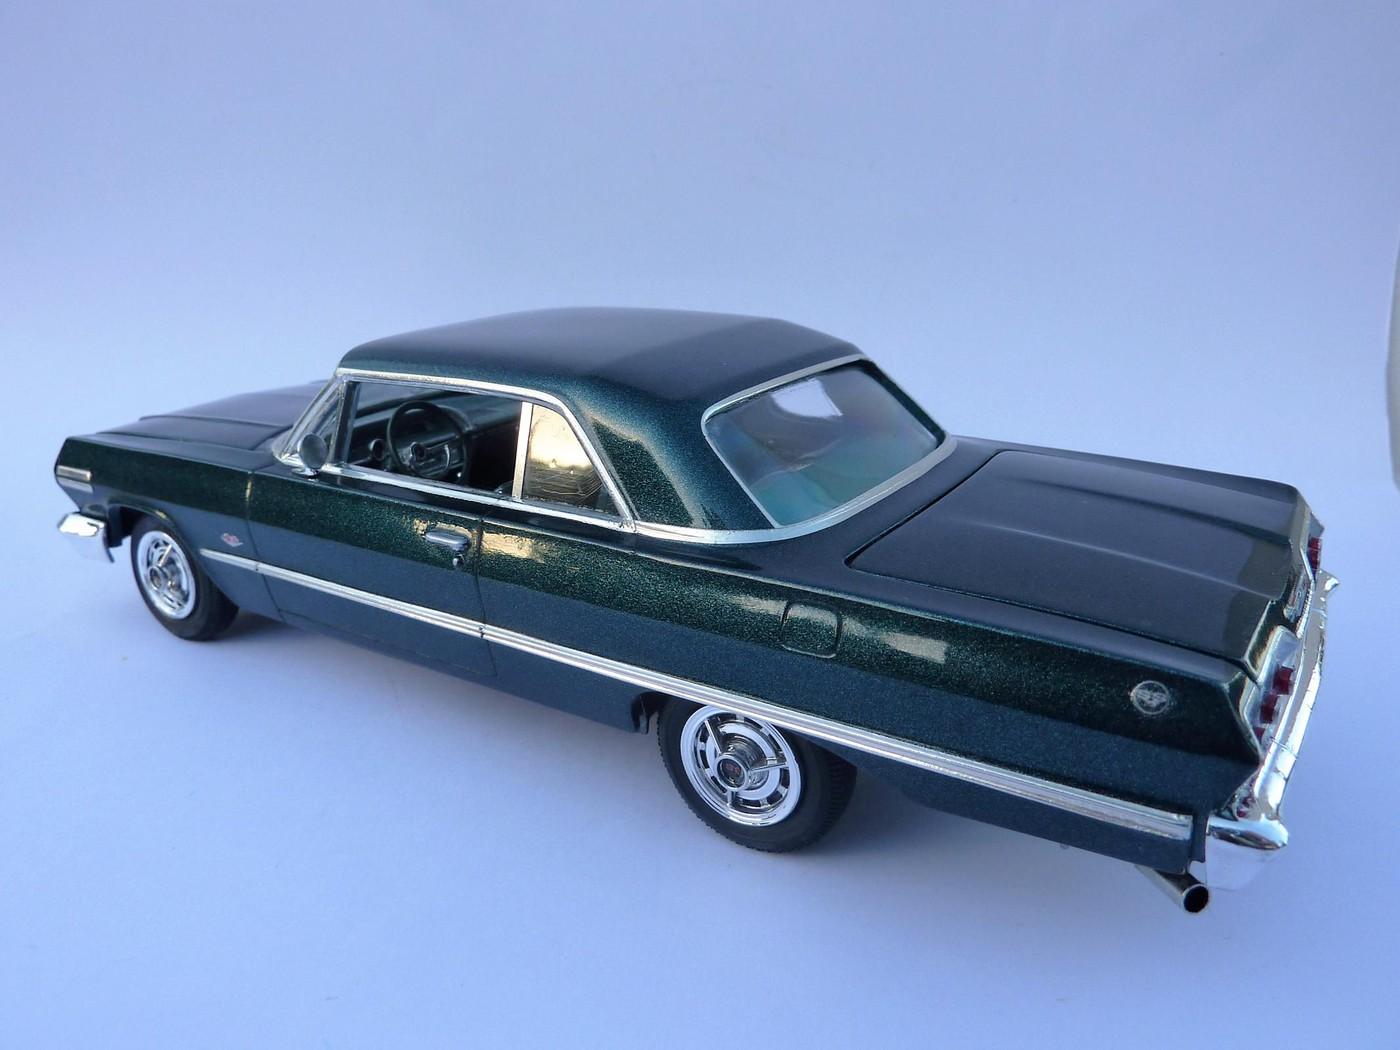 Chevrolet Impala 63 terminée - Page 2 Photo22-vi